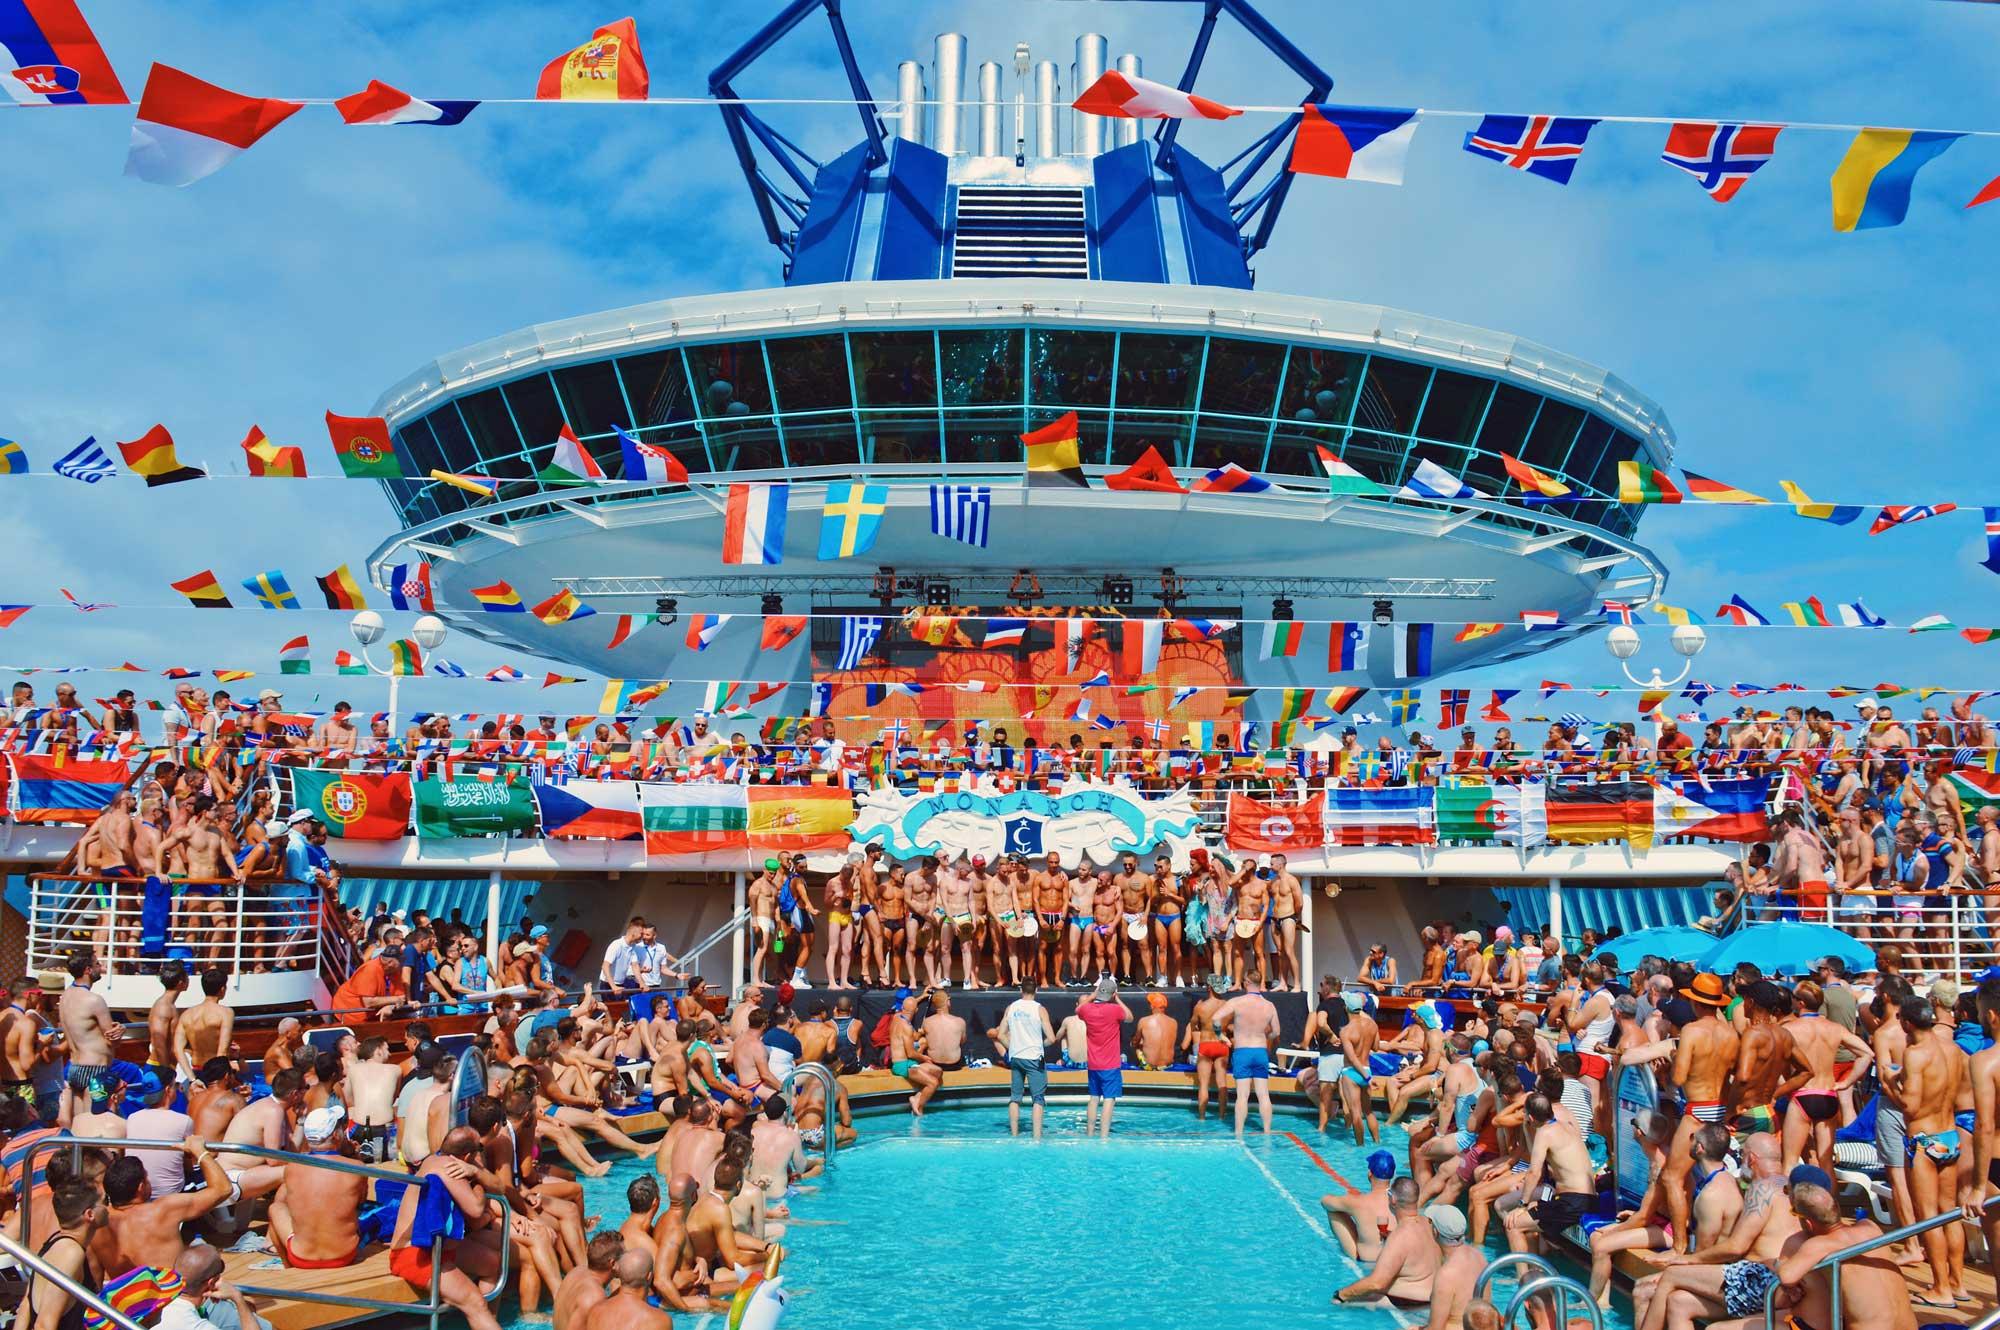 That's the best Photo of The Cruise 2017 © CoupleofMen.com